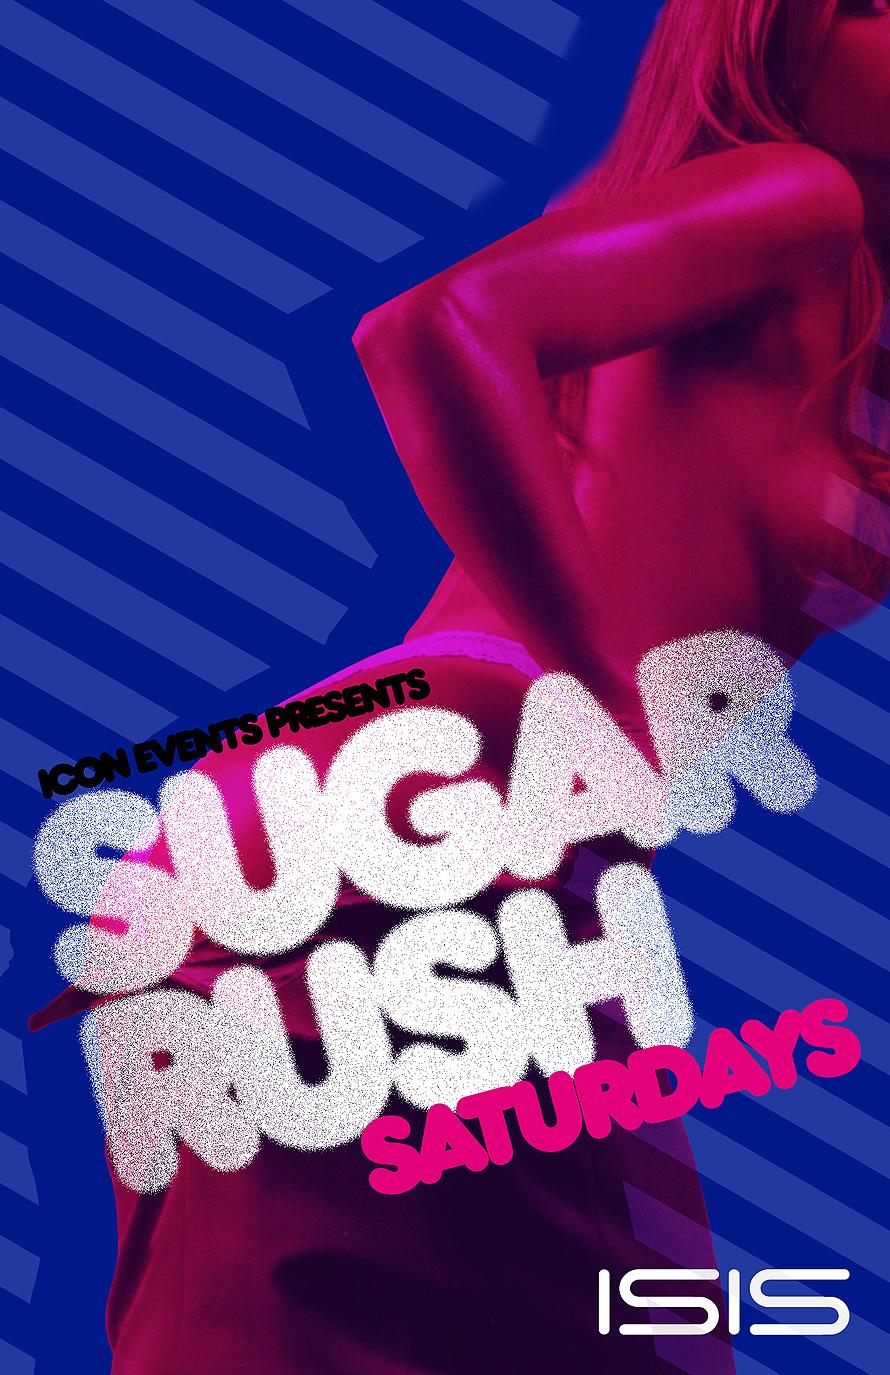 Sugar Rush Saturdays Event at Club Isis